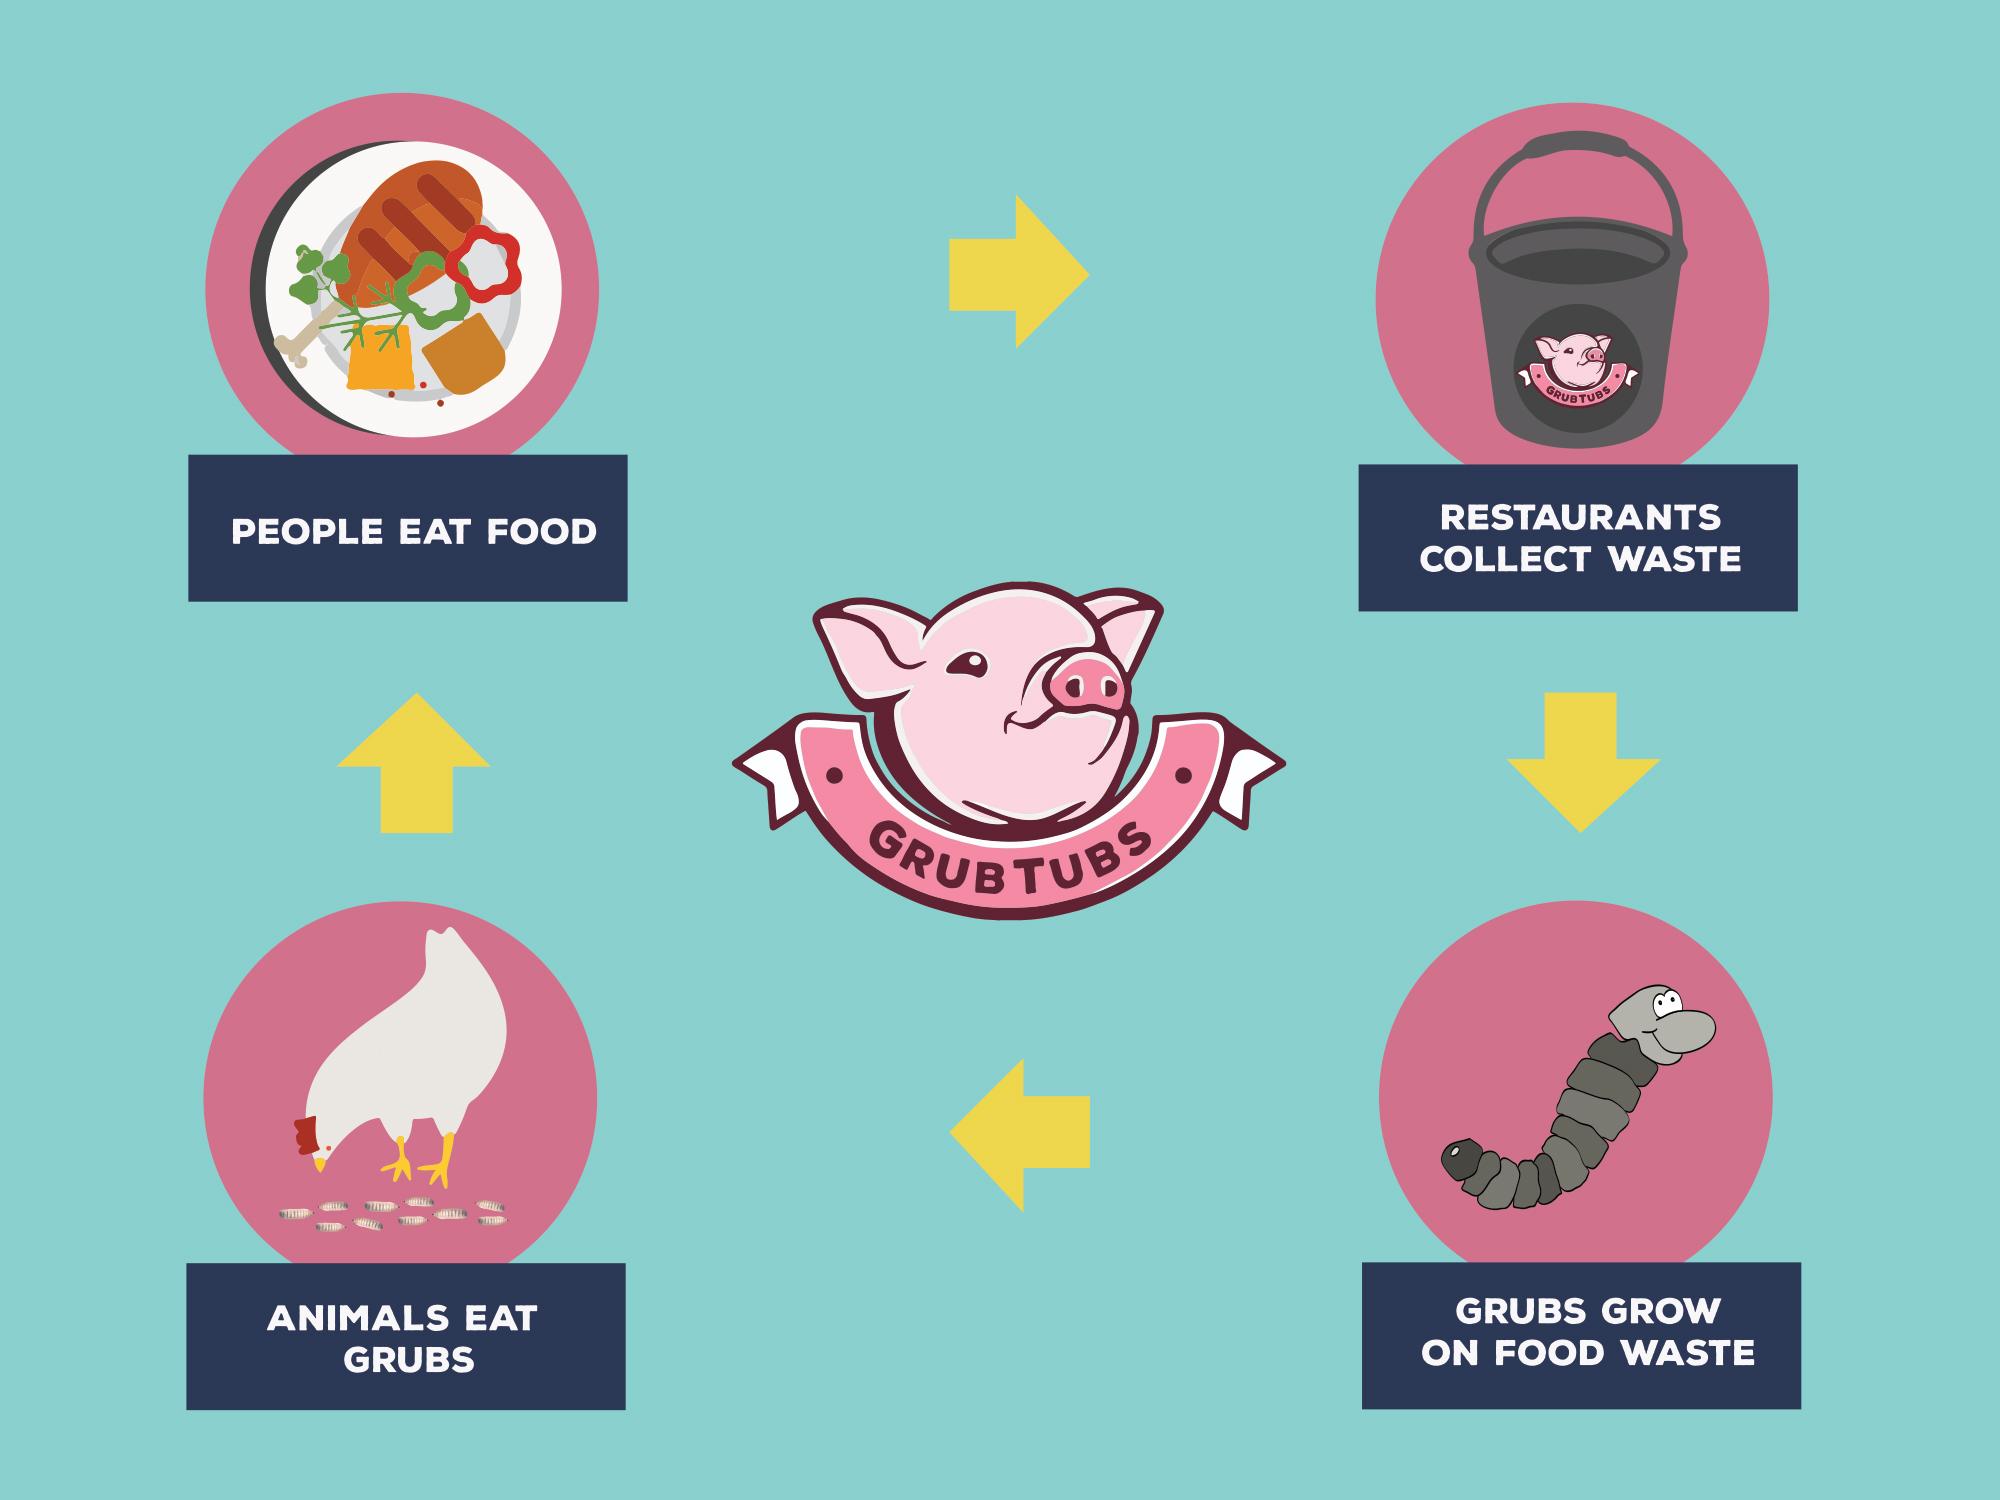 grubtubs-food-waste-recycling-service.jpg